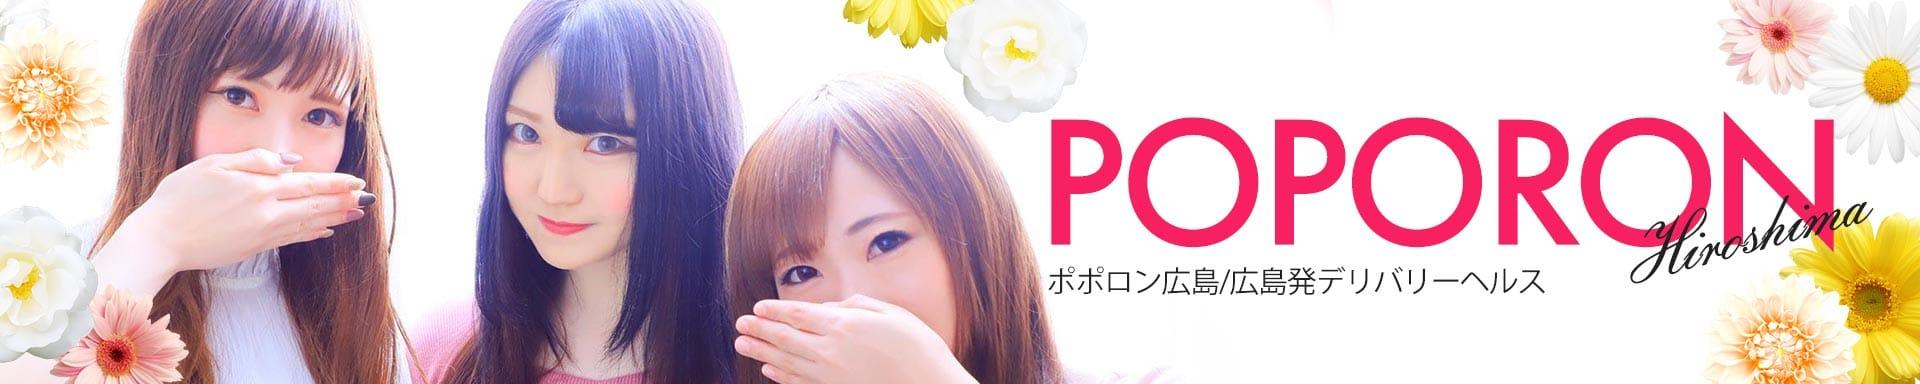 ポポロン☆広島 - 広島市内